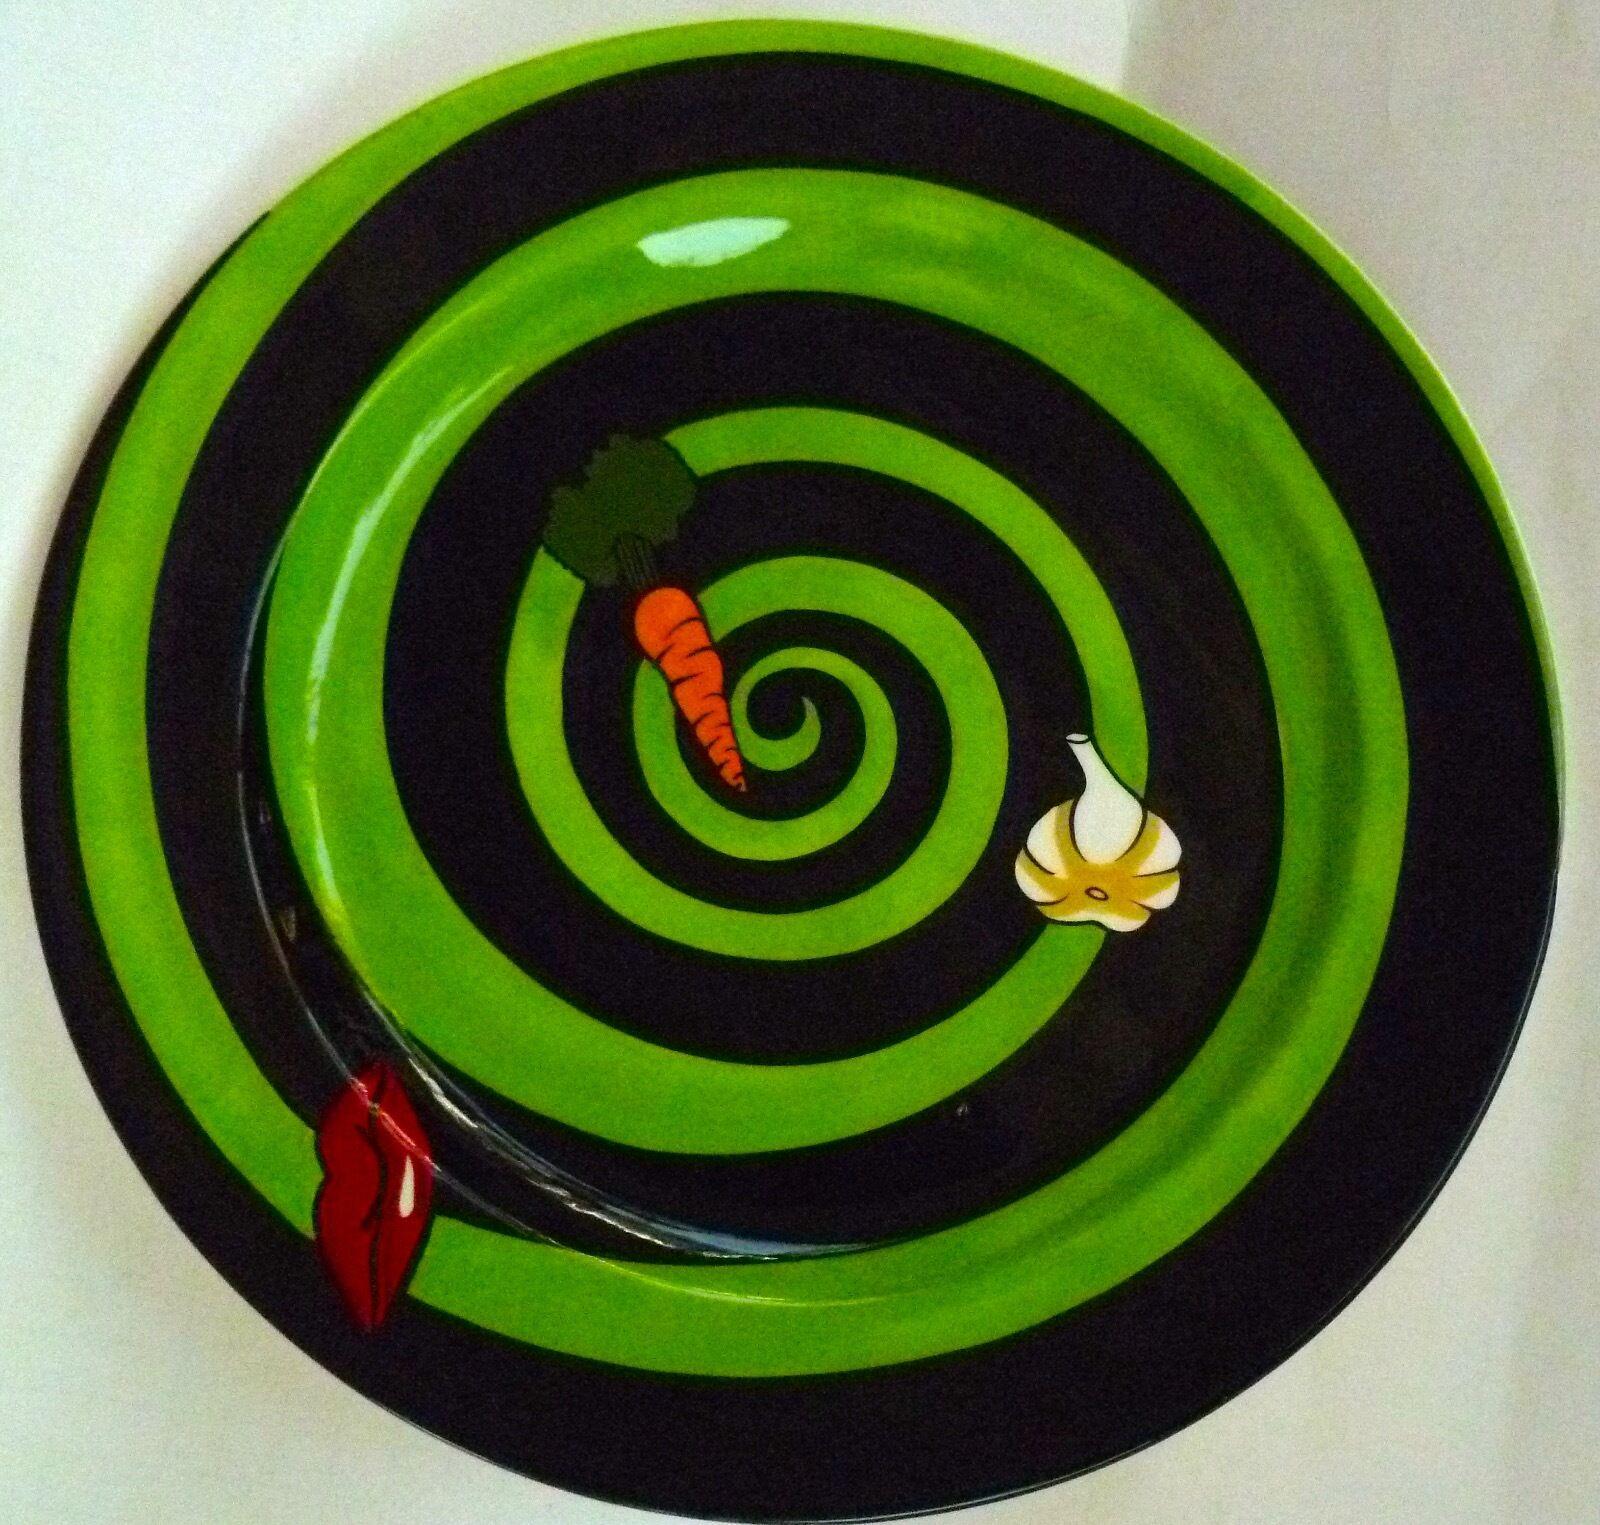 DECORATIVE PLATTER BY ARTIST KAREN BARONE  SPIRALING TARGET W VEG & RED LIPS